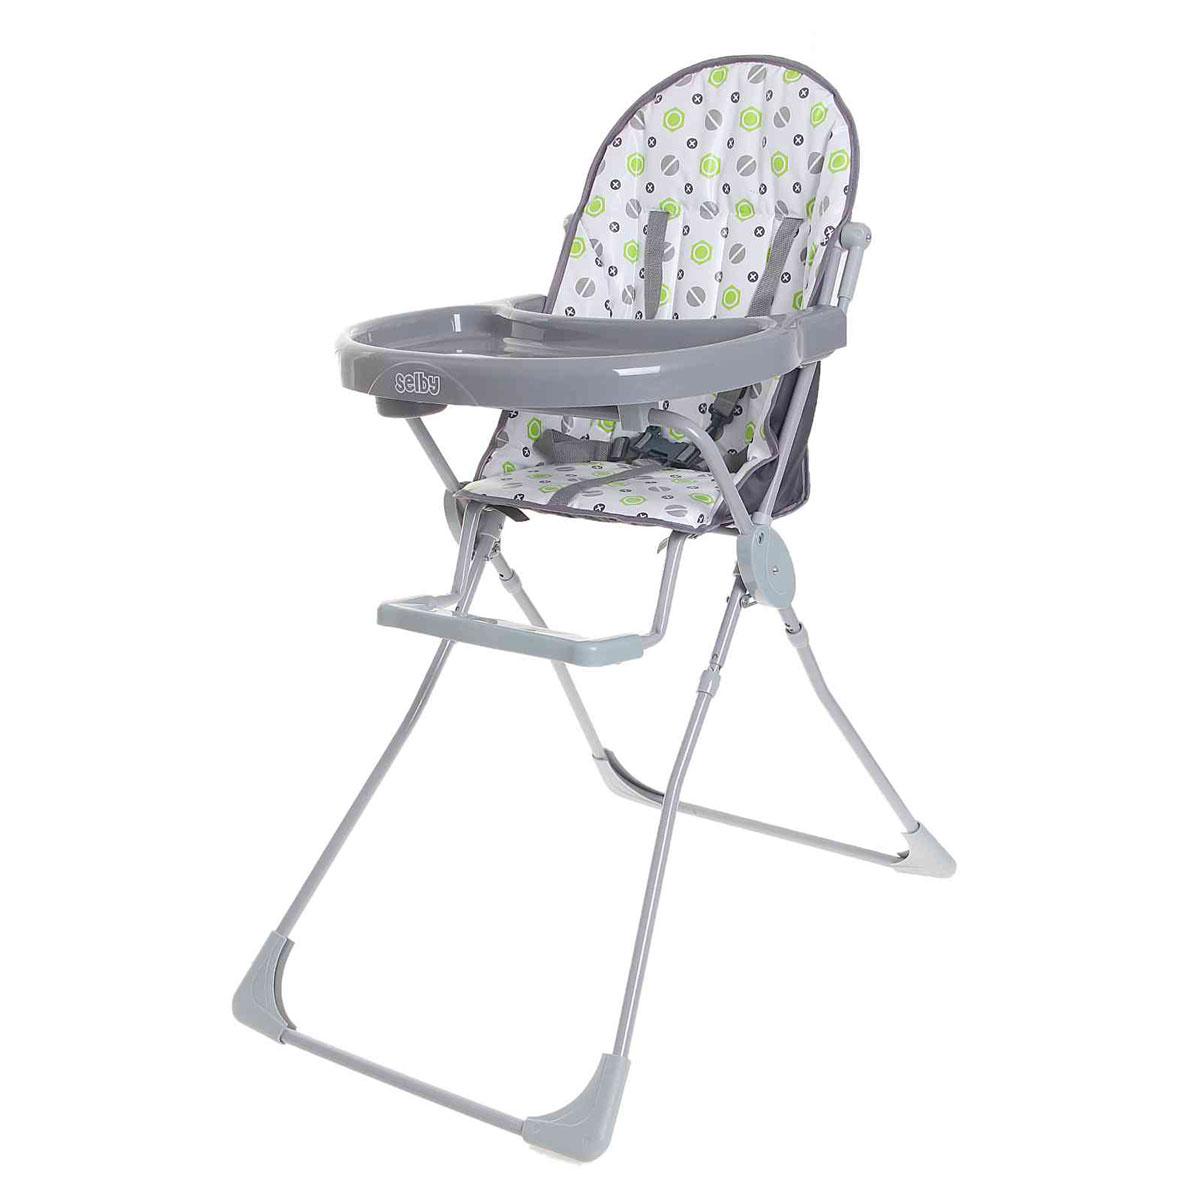 Selby Стульчик для кормления цвет серый selby стульчик для кормления цвет белый зеленый 827378